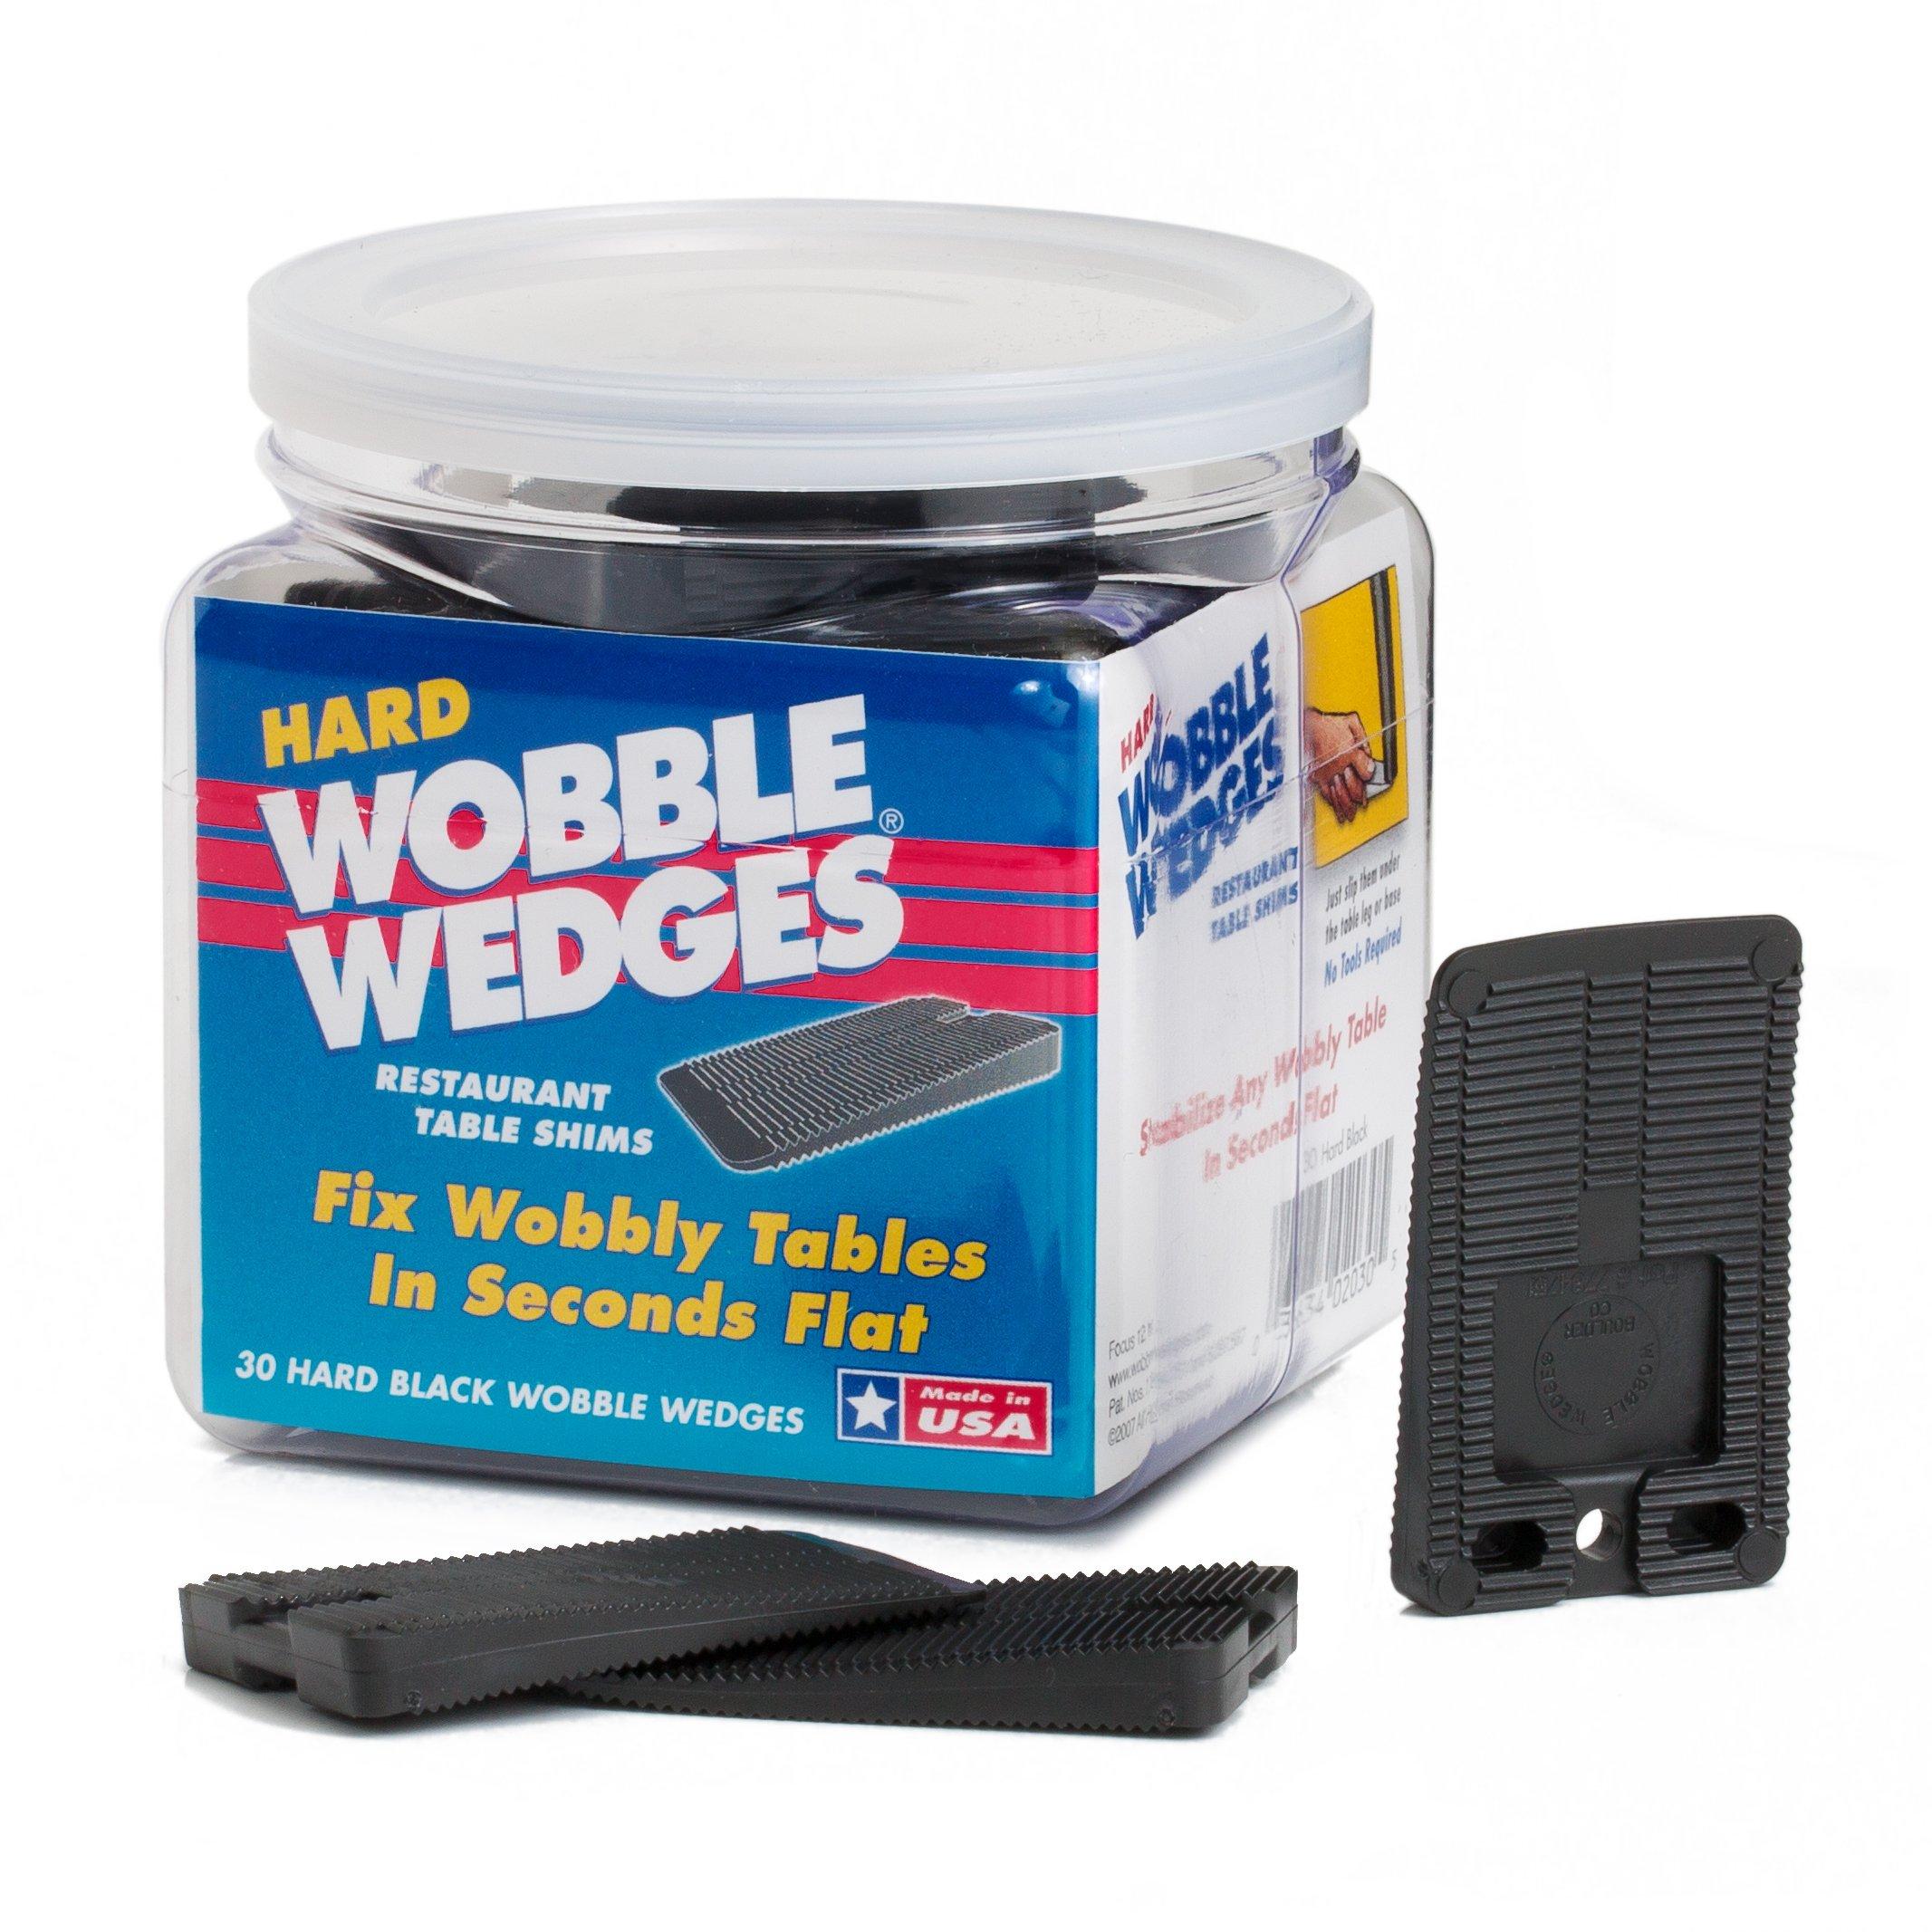 Wobble Wedge - Hard Black - Restaurant Table Shims - 30 Piece Jar by WOBBLE WEDGES